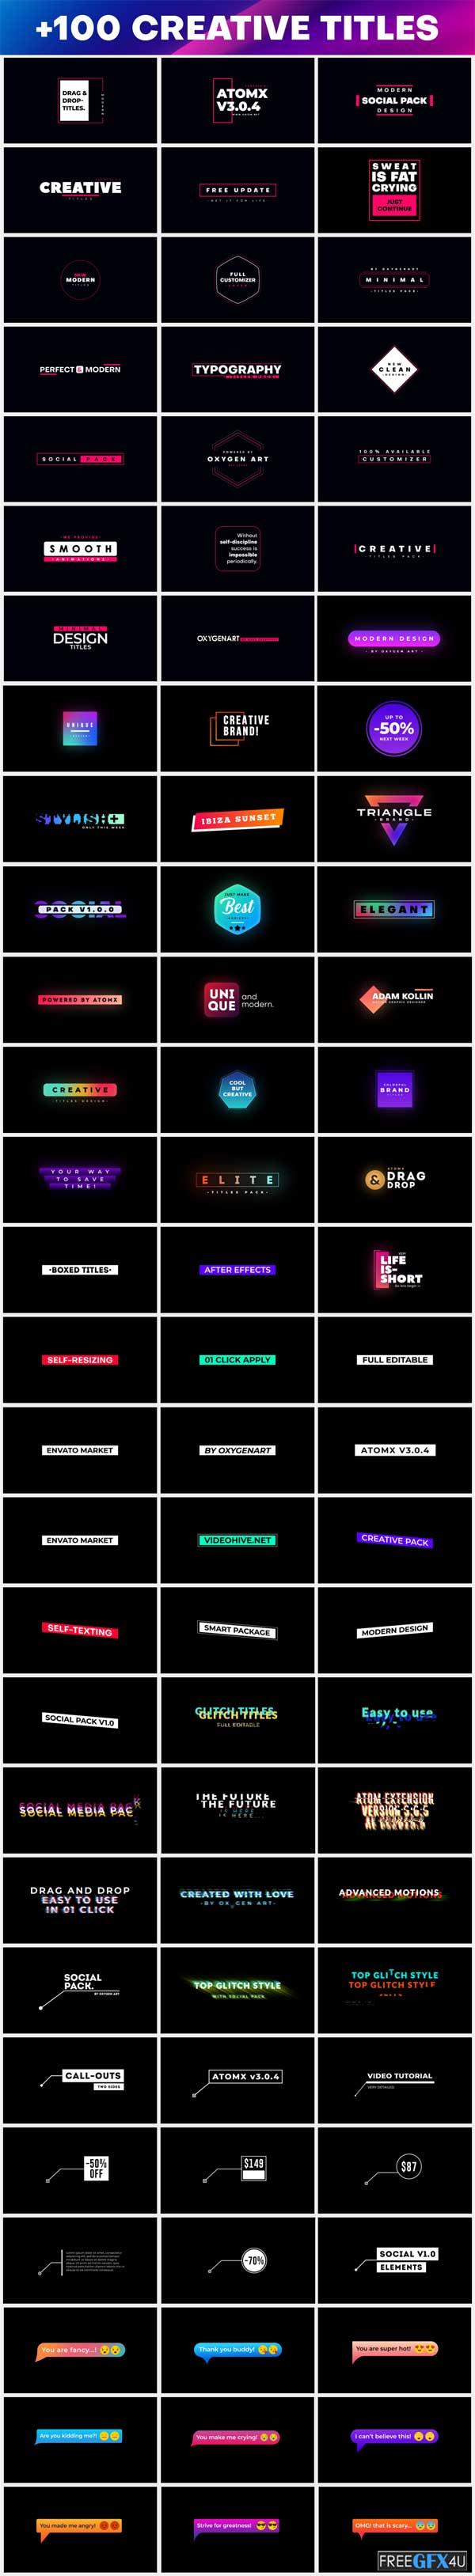 100+ Creative Titles